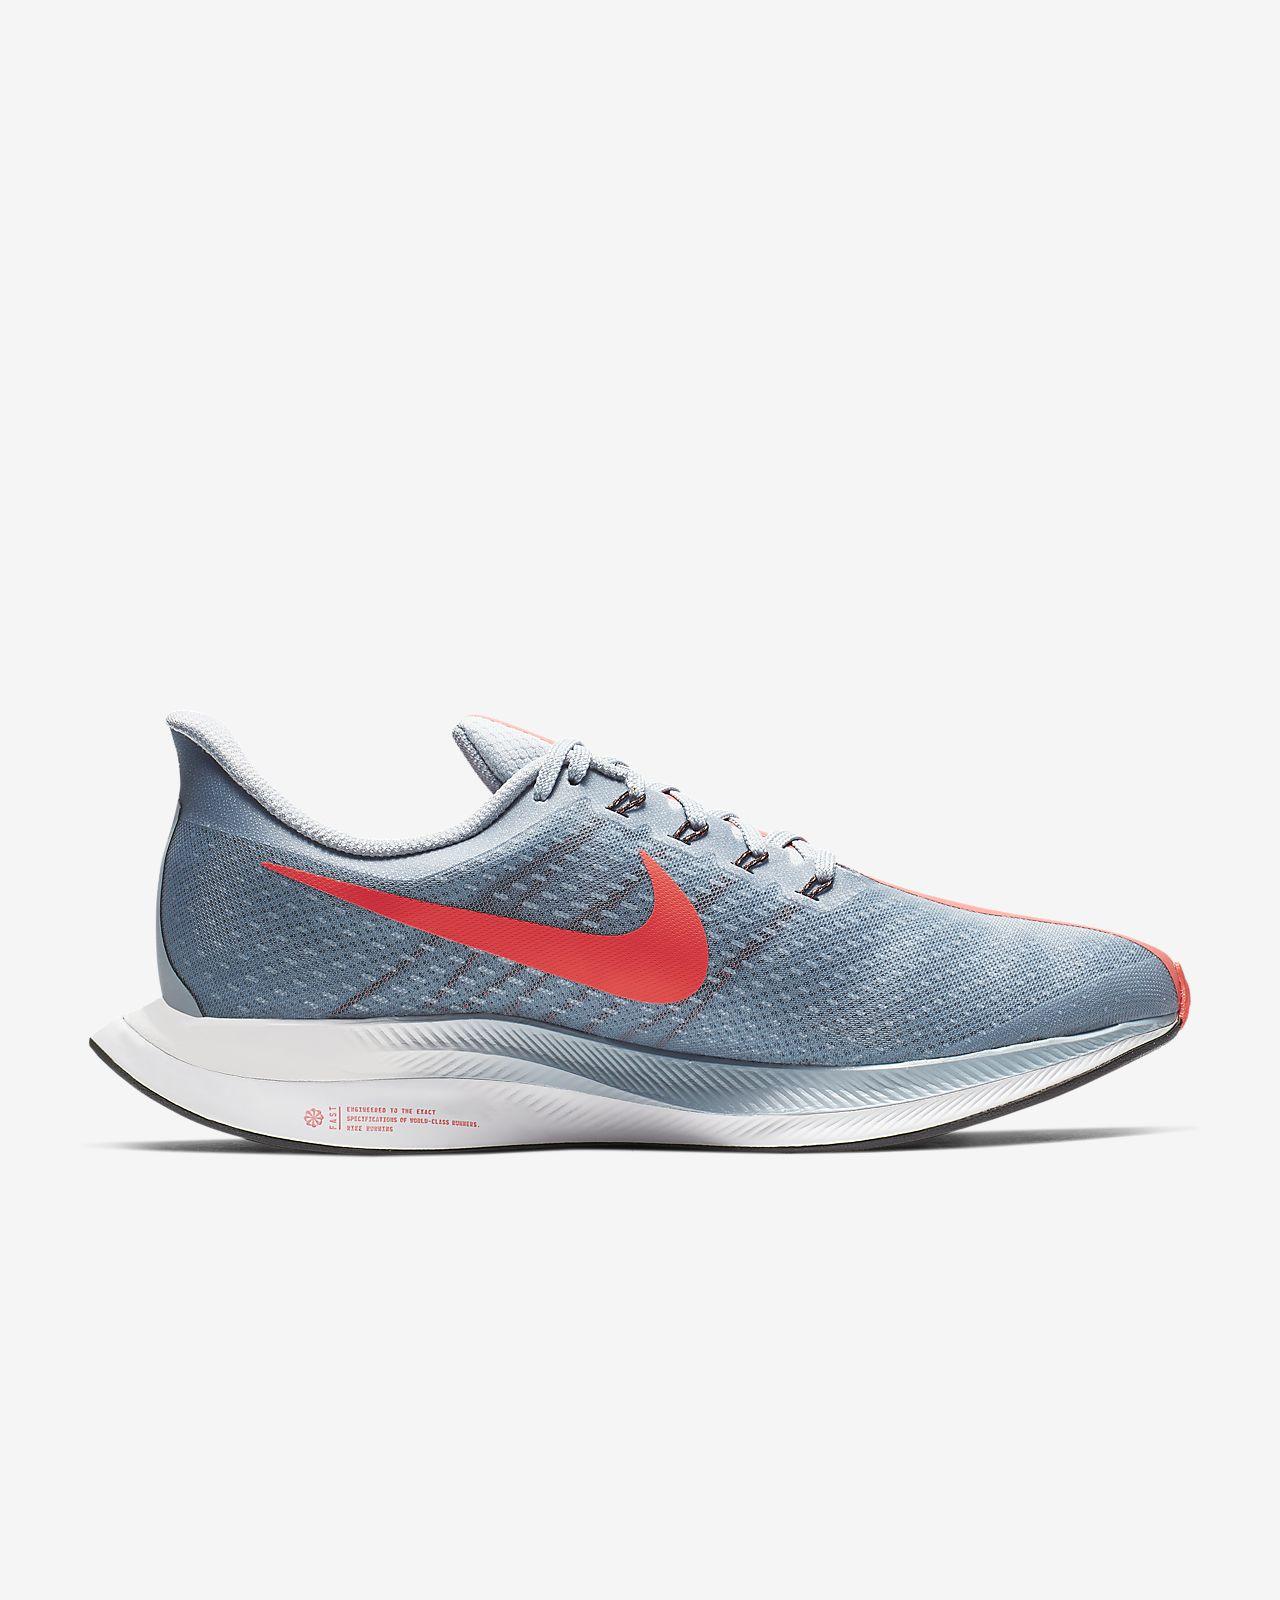 san francisco cecd1 4fdce ... Löparsko Nike Zoom Pegasus Turbo för män